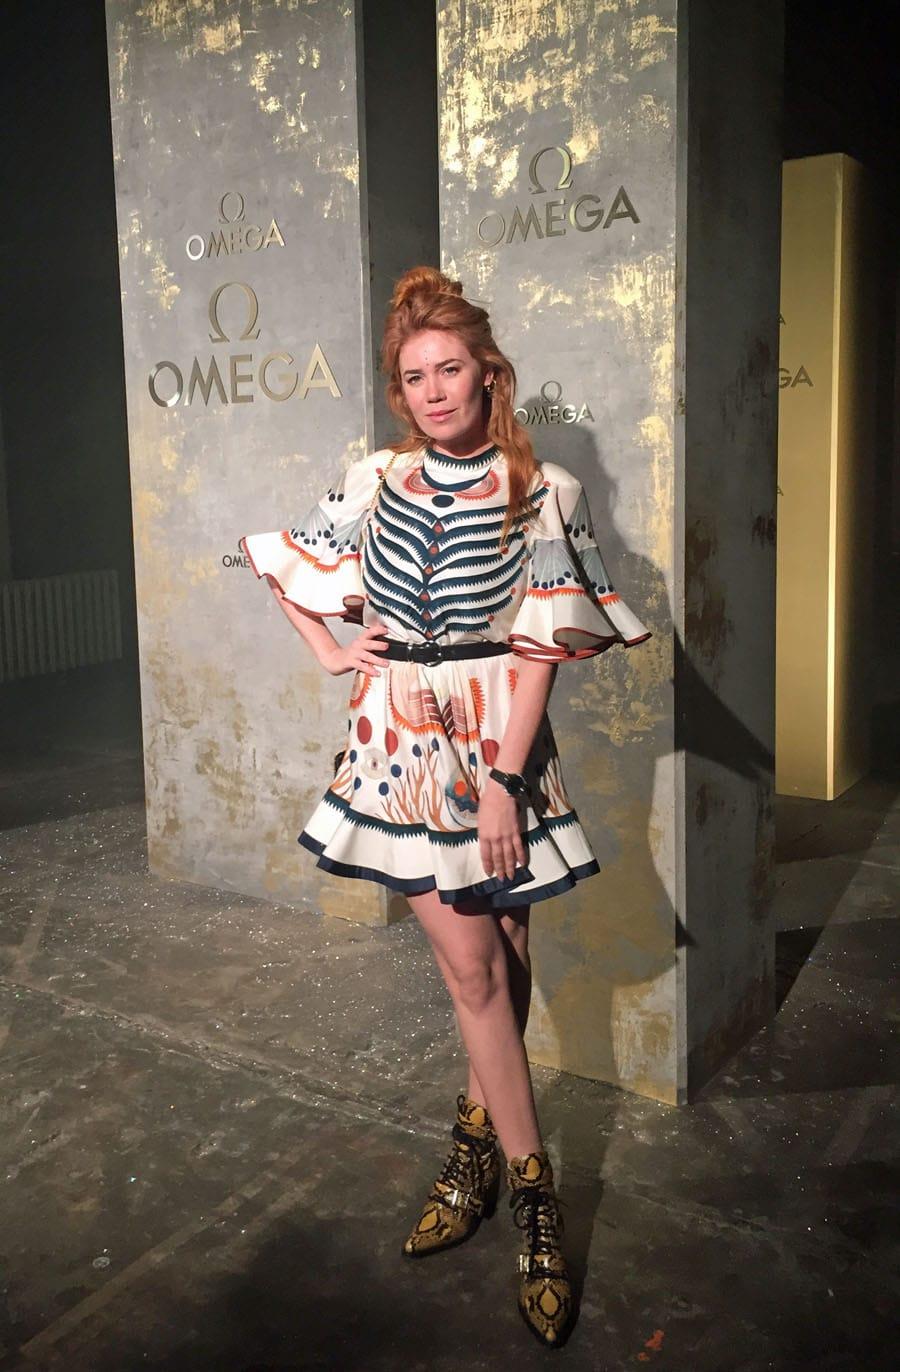 Omega-Event: Launch der neuen Trésor-Kollektion mit Palina Rojinski